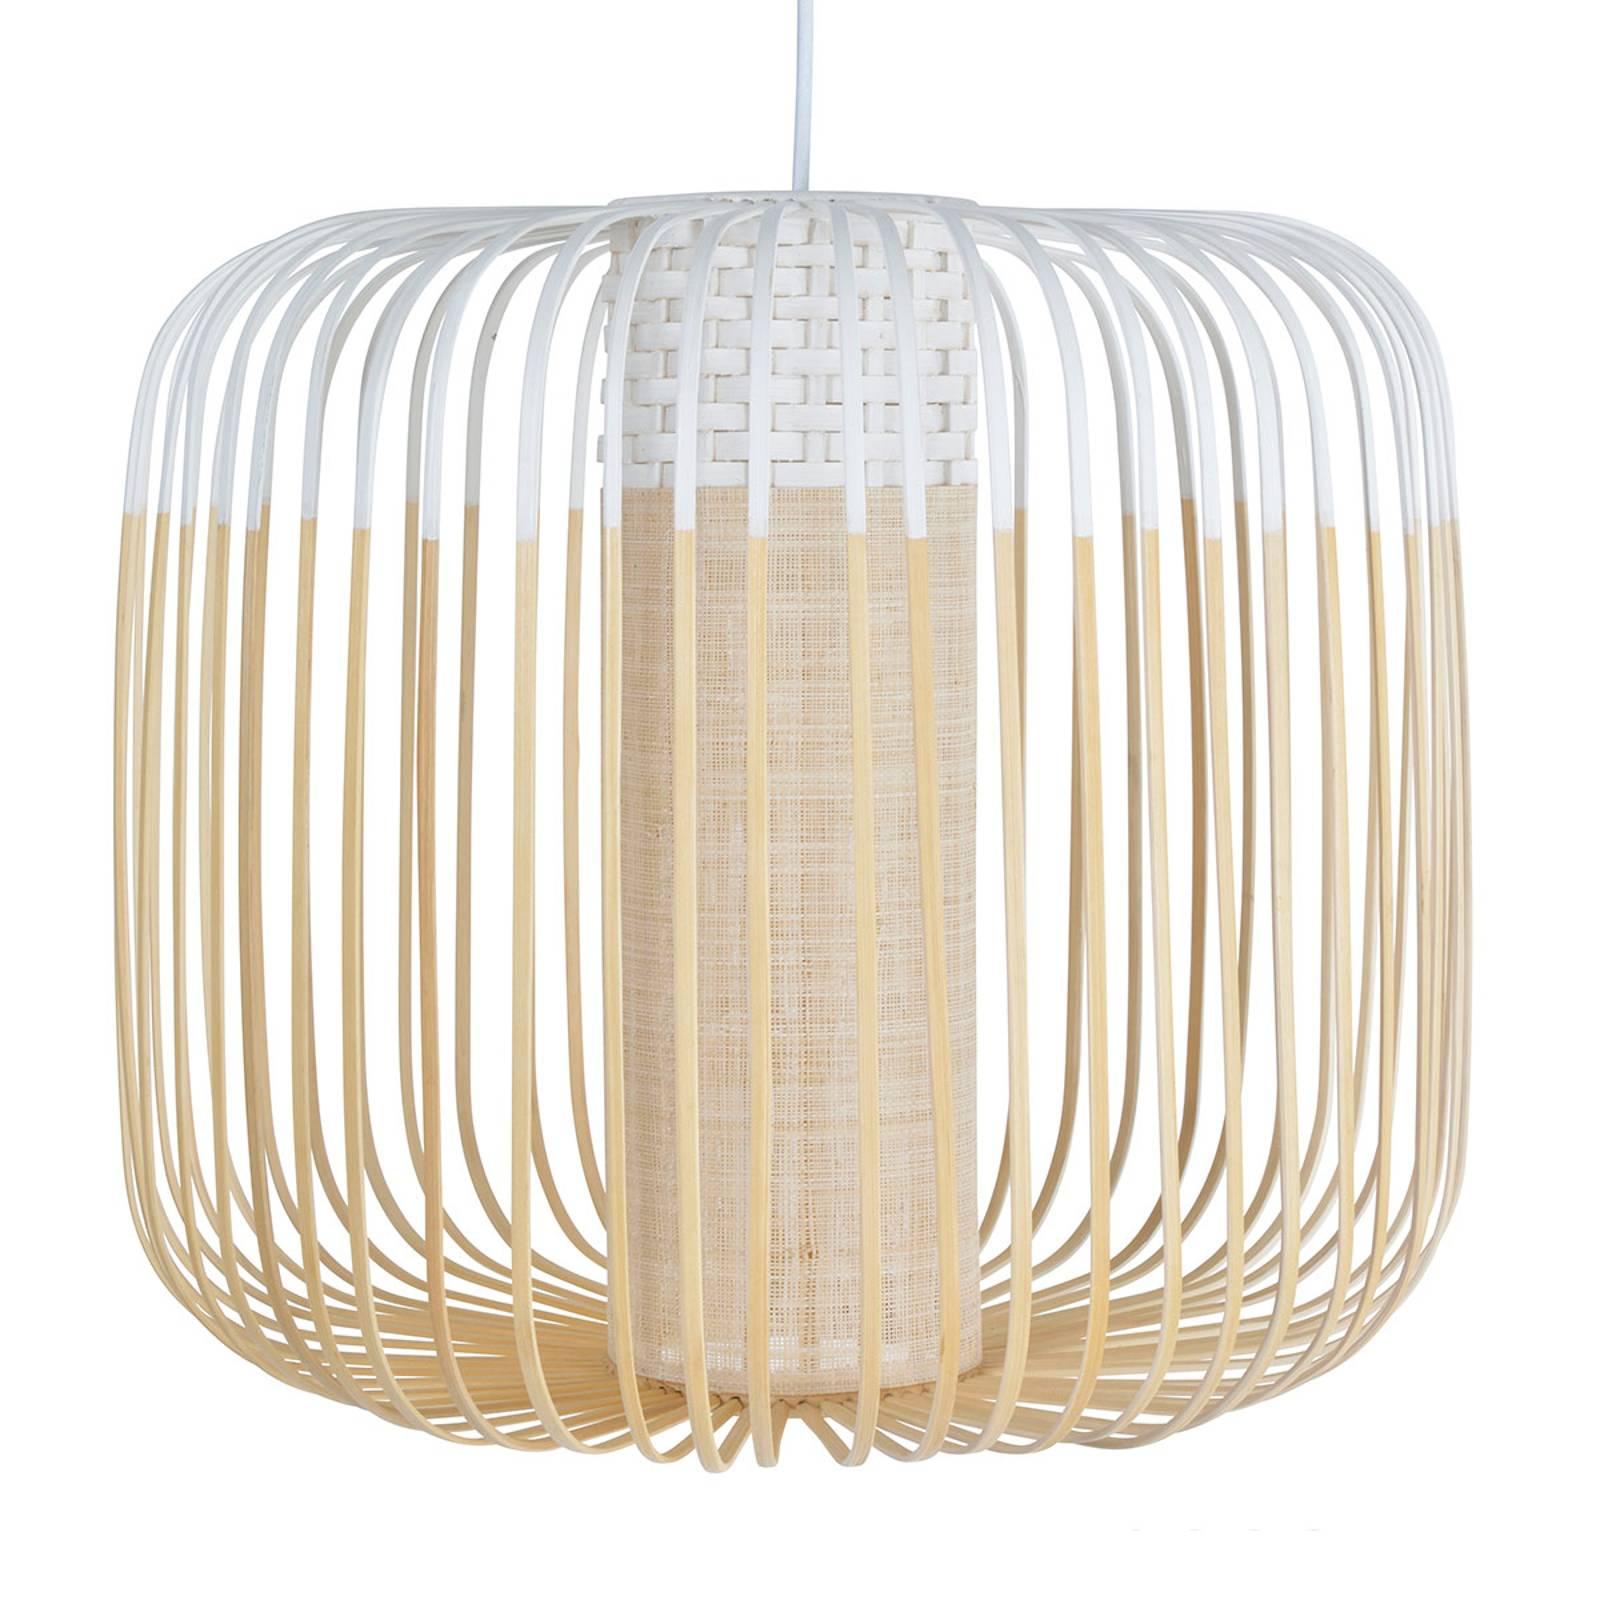 Forestier Bamboo Light M hanglamp 45 cm wit